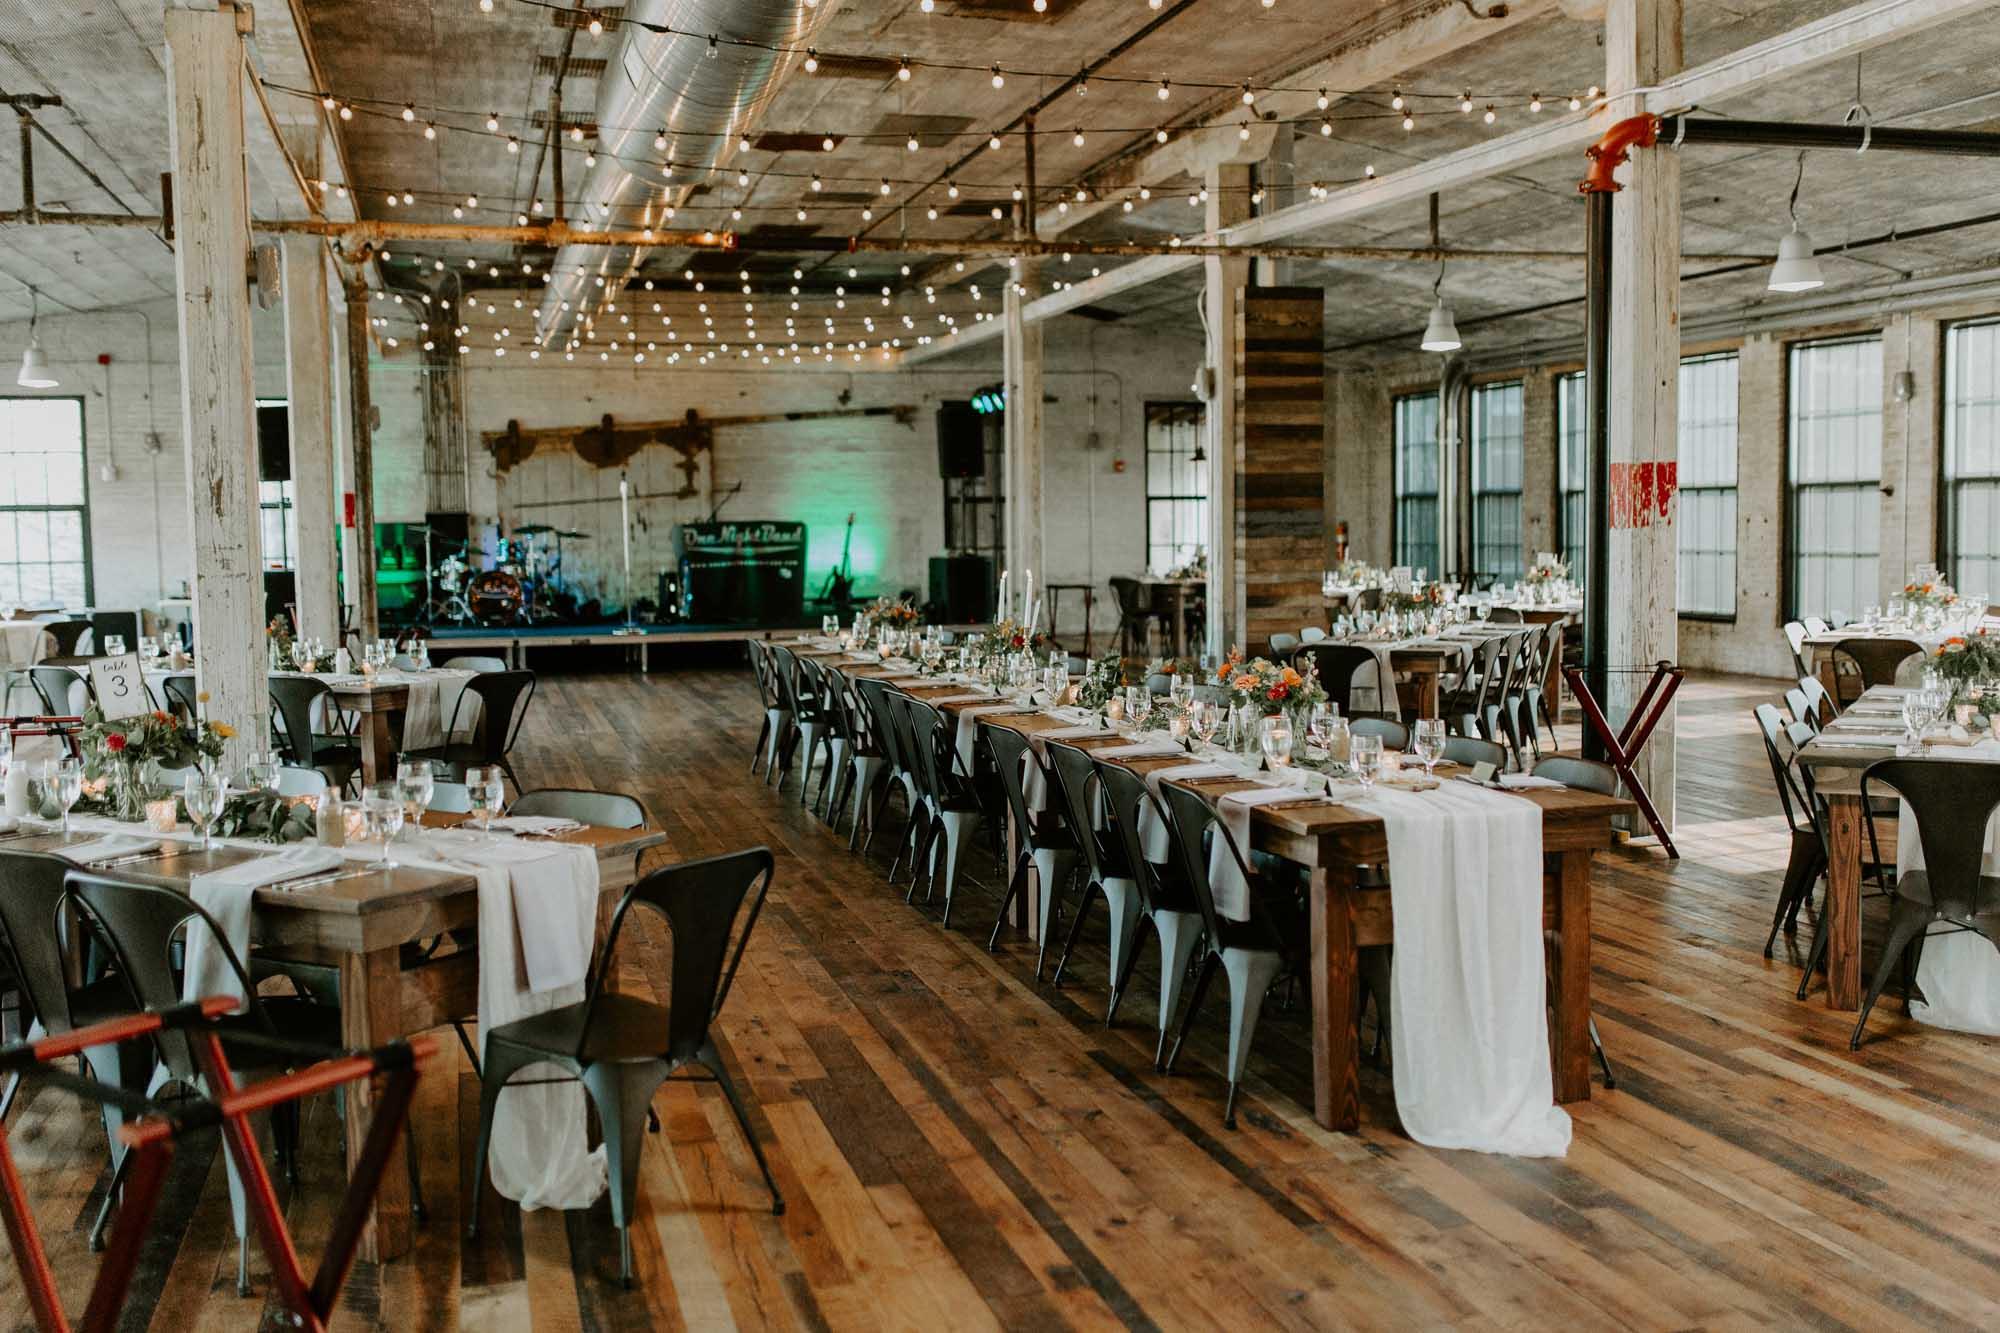 journeyman_distillery_wedding_photographer_chicago_il_wright_photographs-4087.jpg